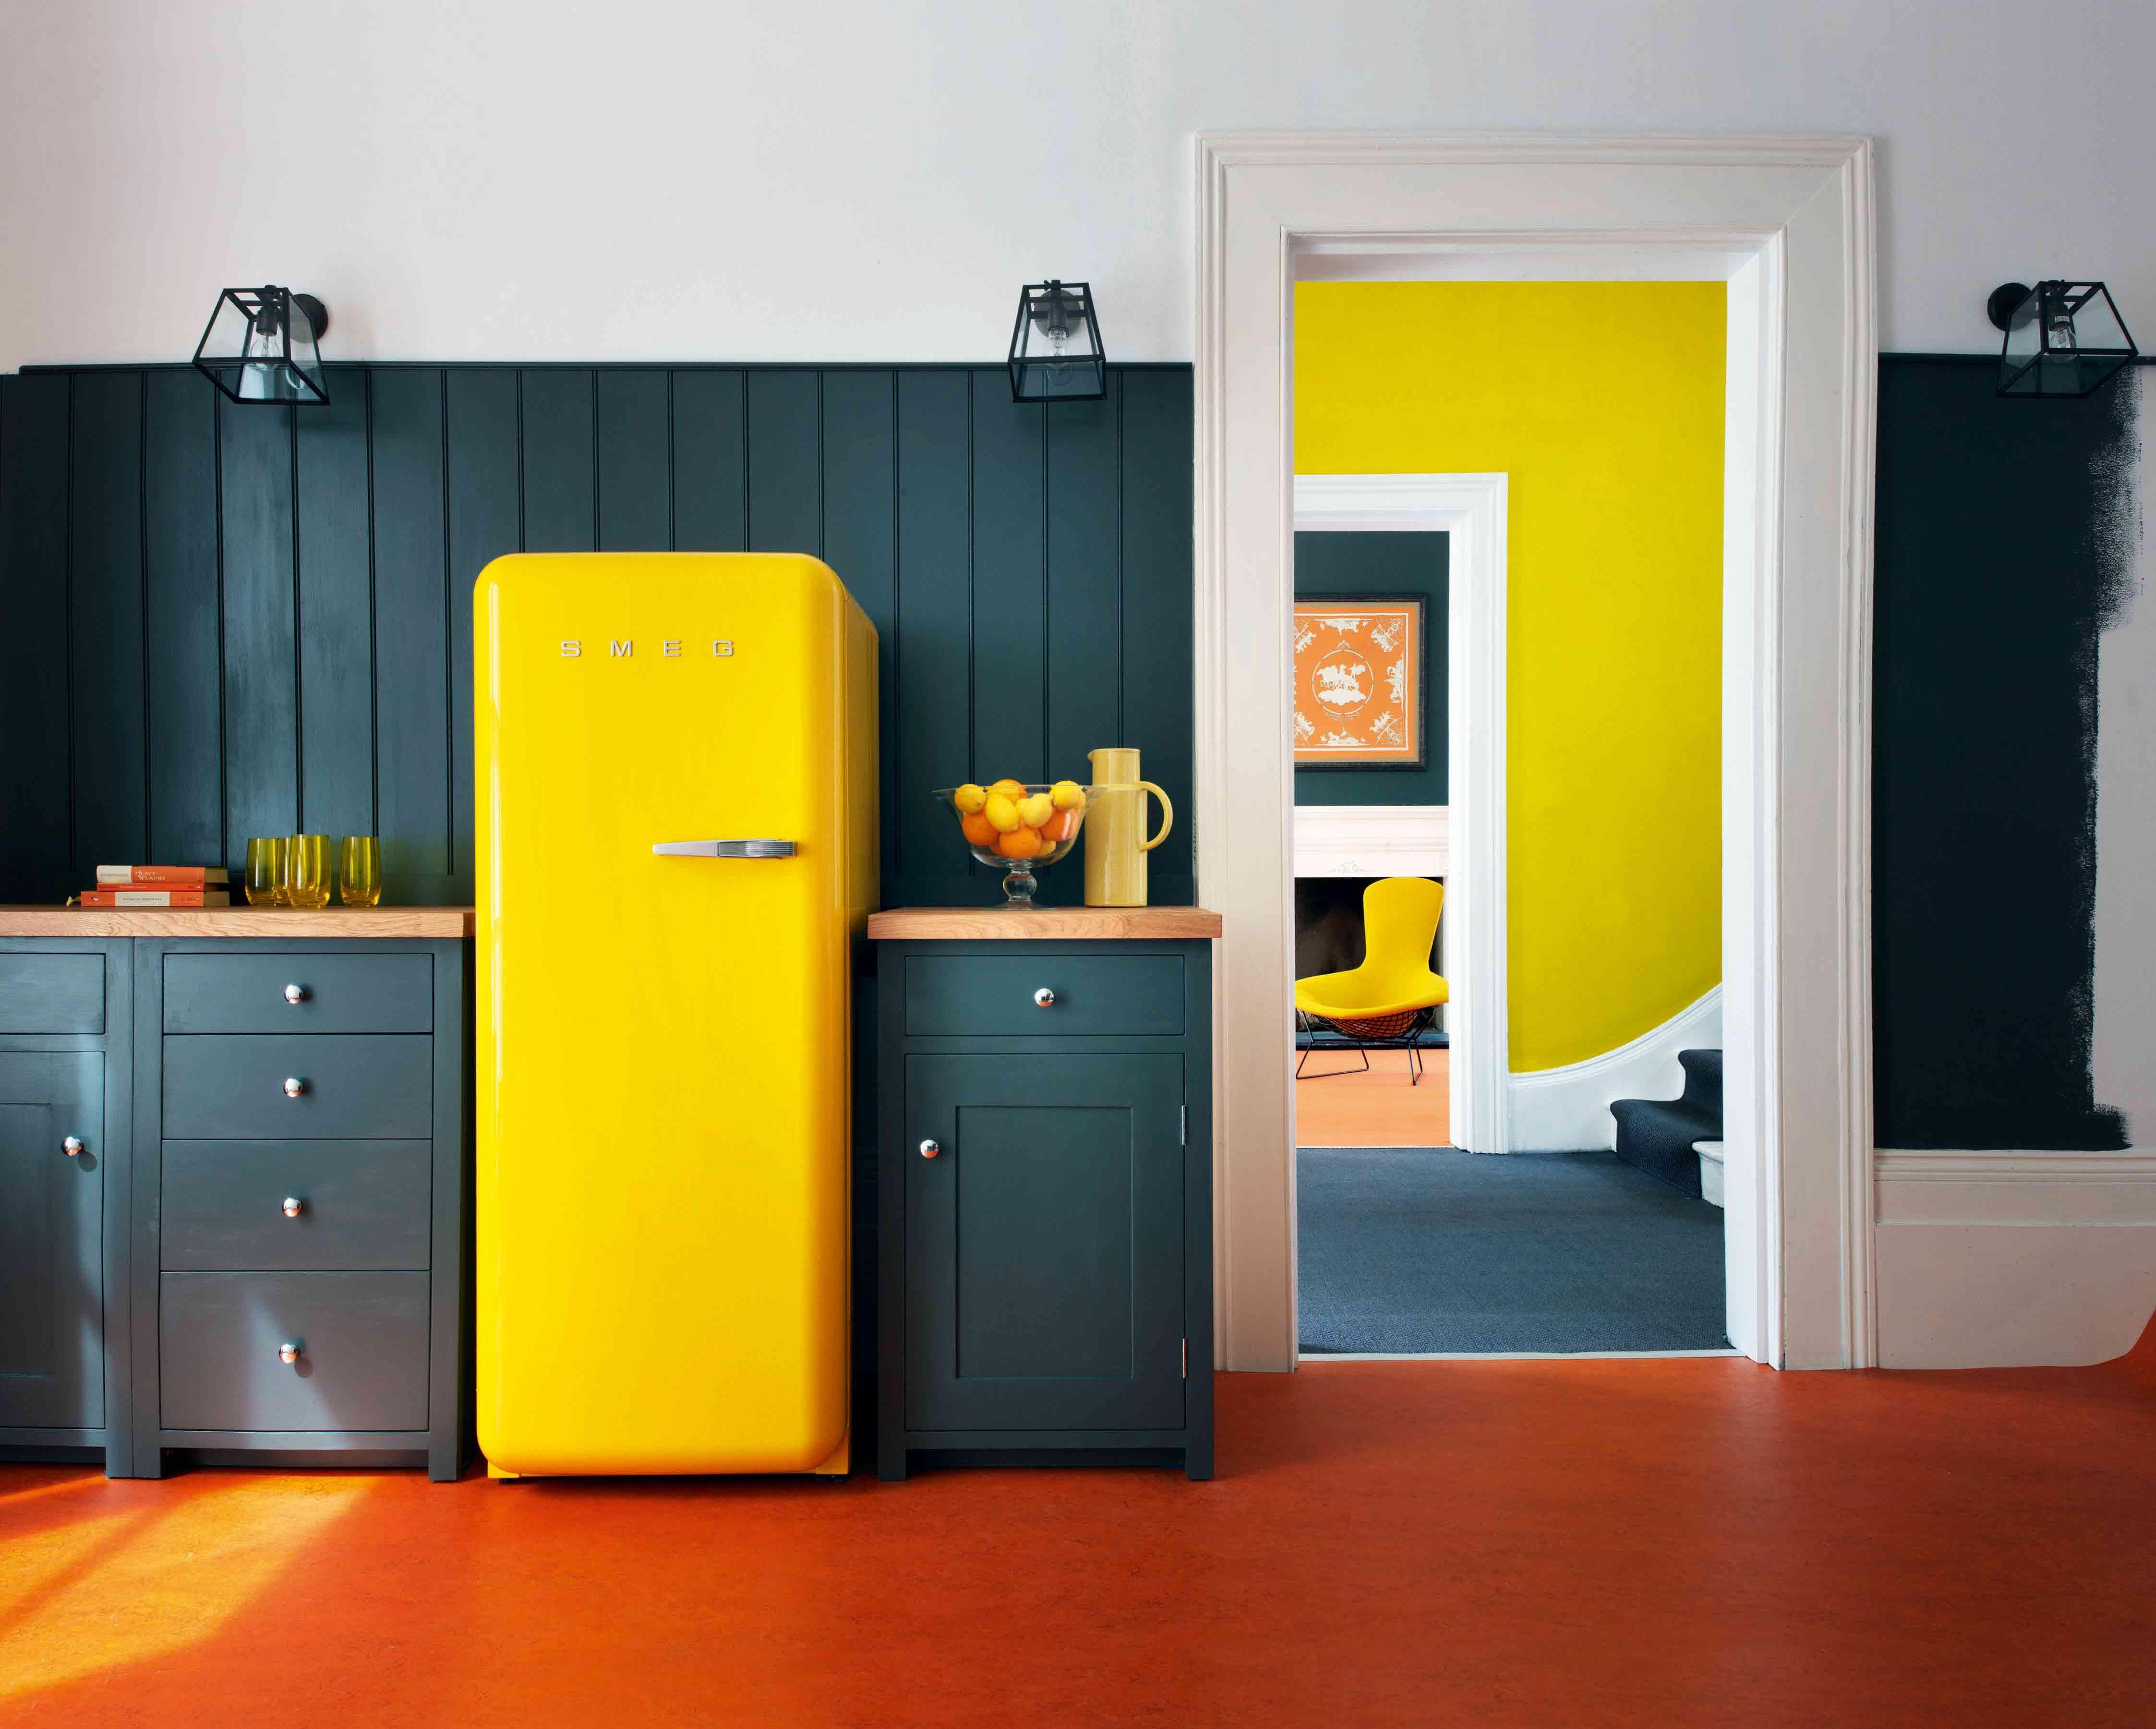 yellow fridge INTERIOR DECORATING Pinterest